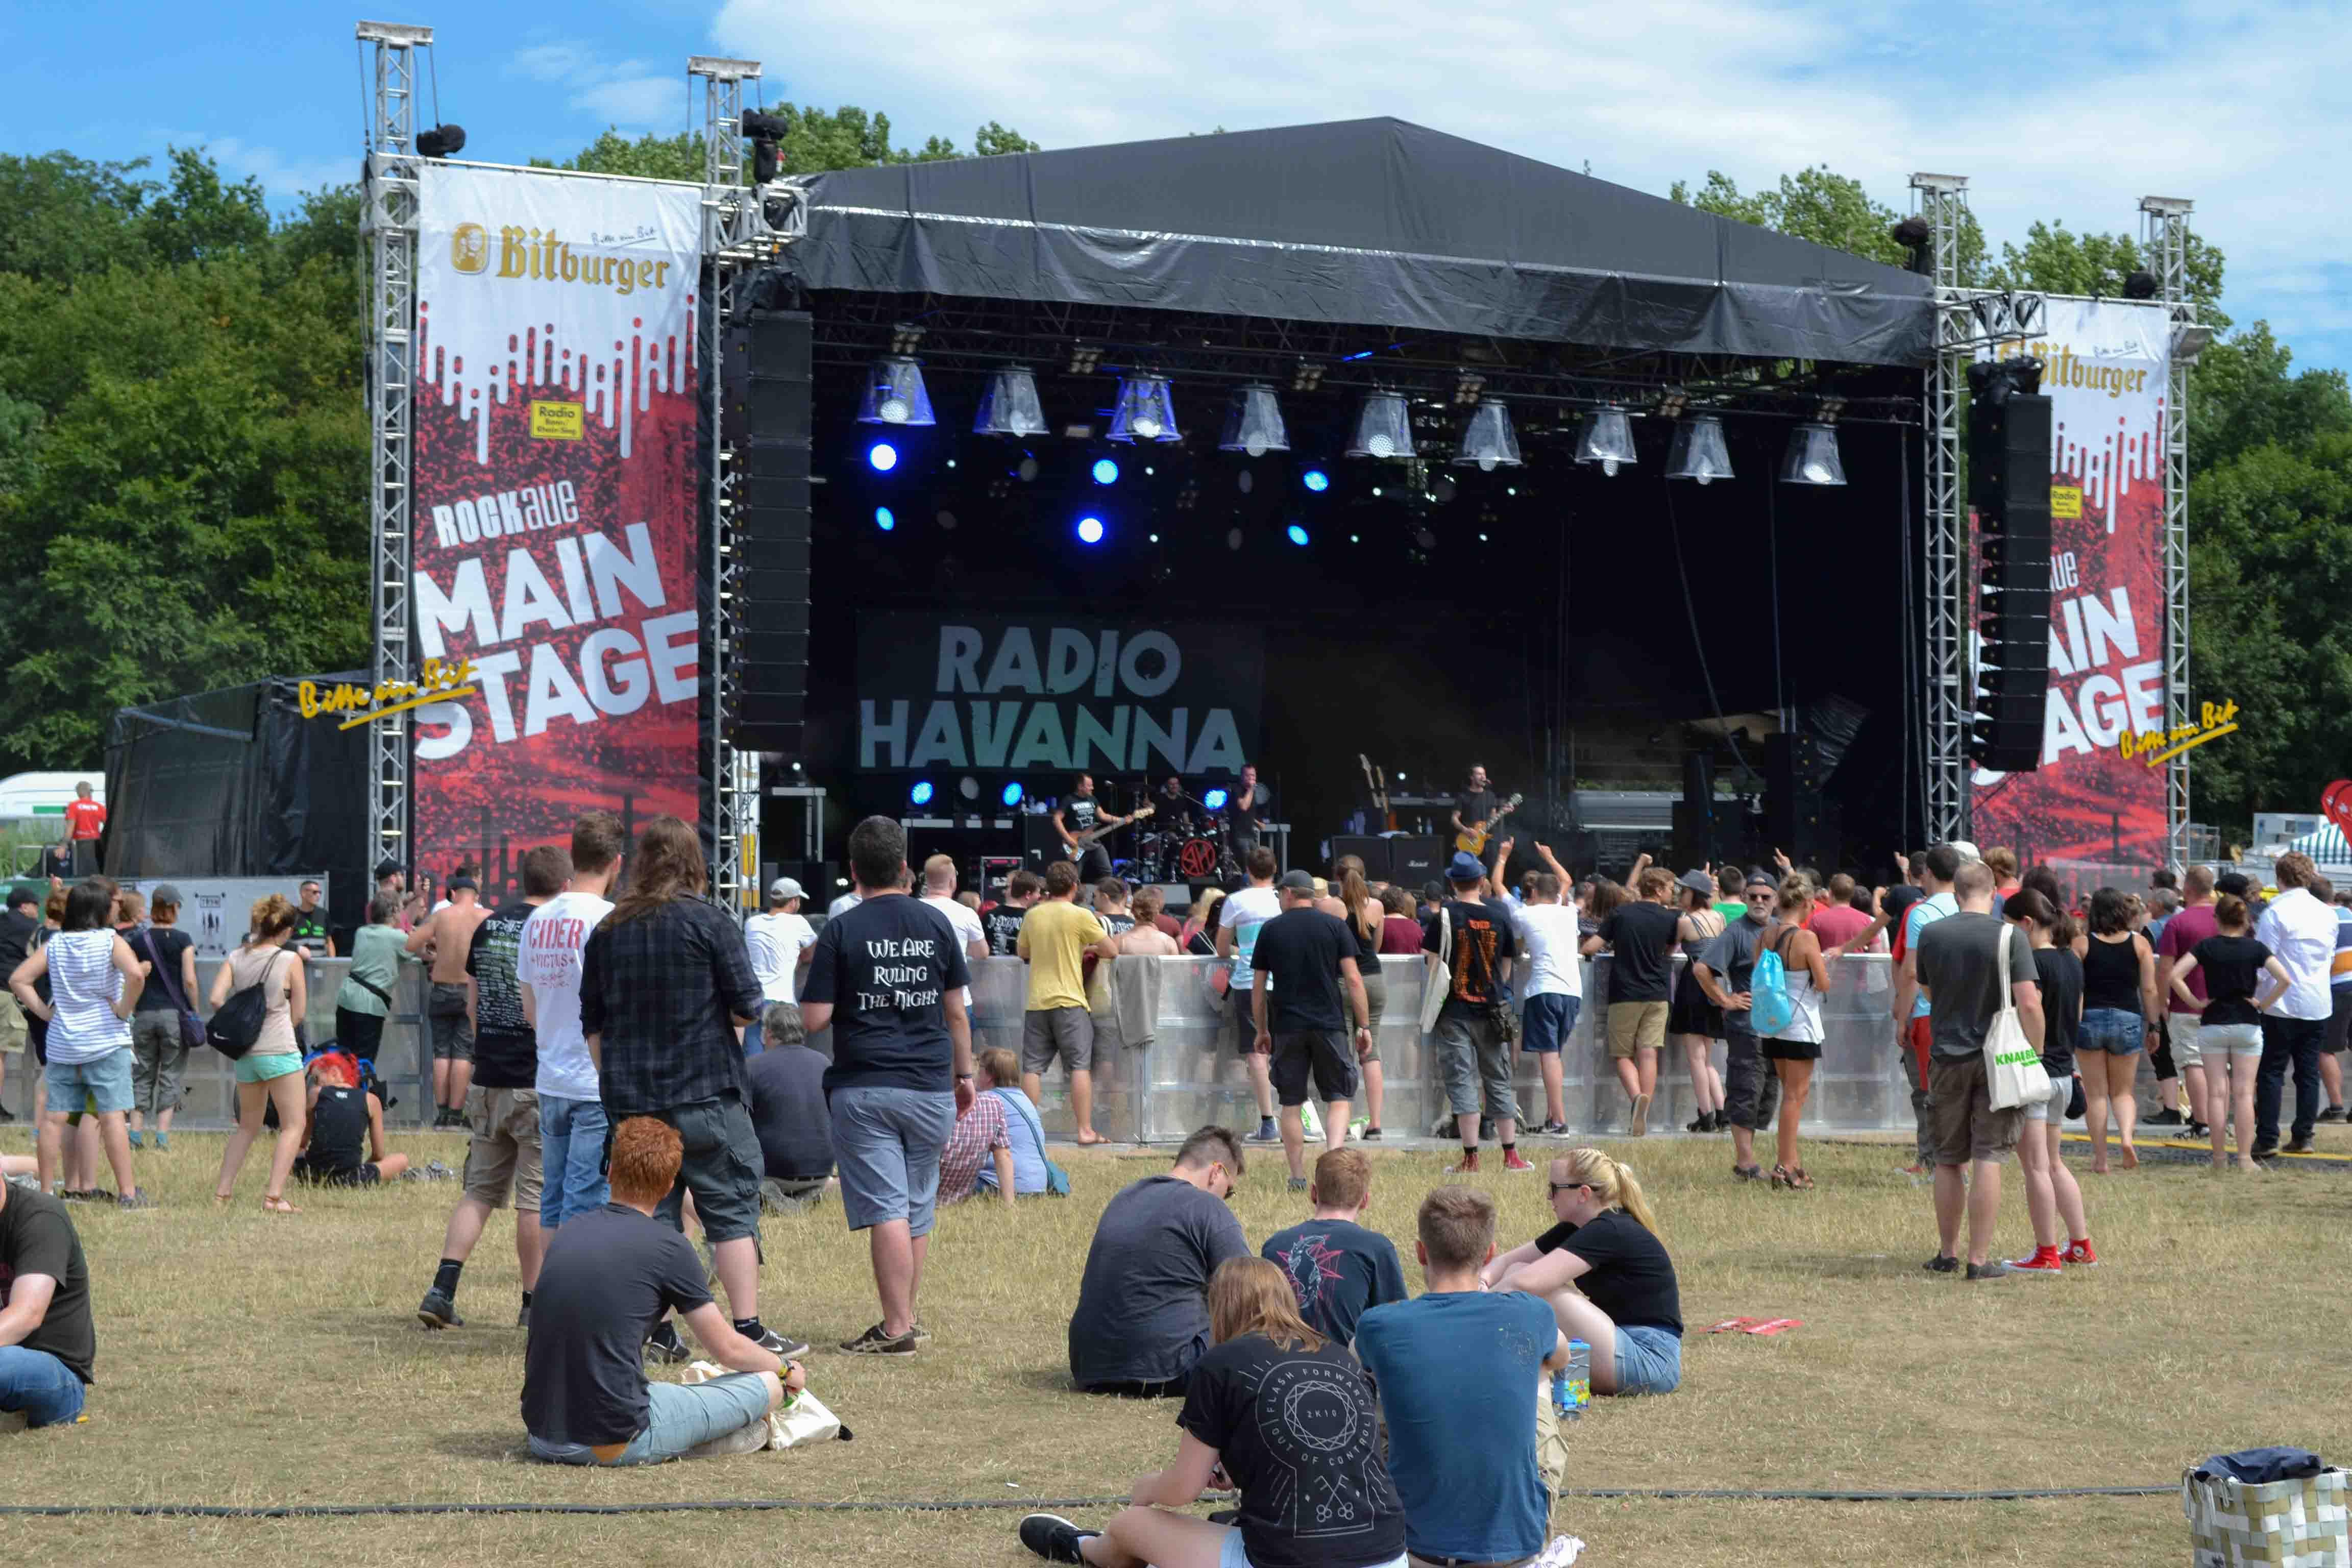 Radio Havanna, Rockaue